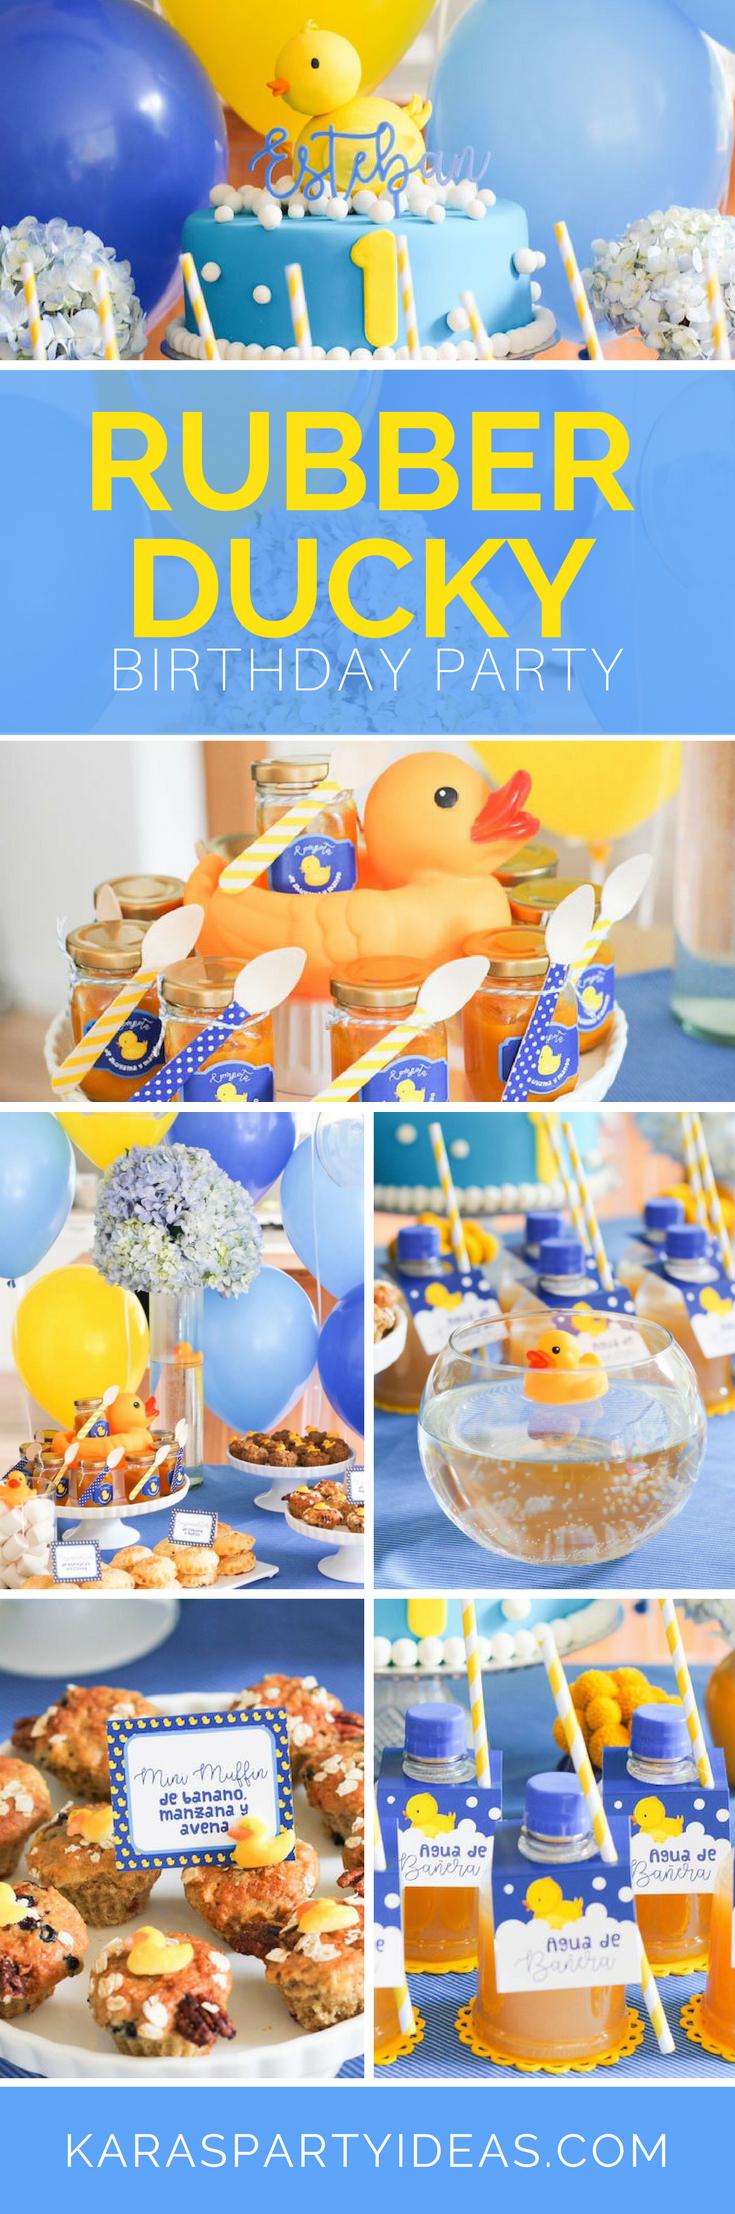 Tea time tea birthday party via kara s party ideas karaspartyideas com - Rubber Ducky Birthday Party Via Kara S Party Ideas Karaspartyideas Com